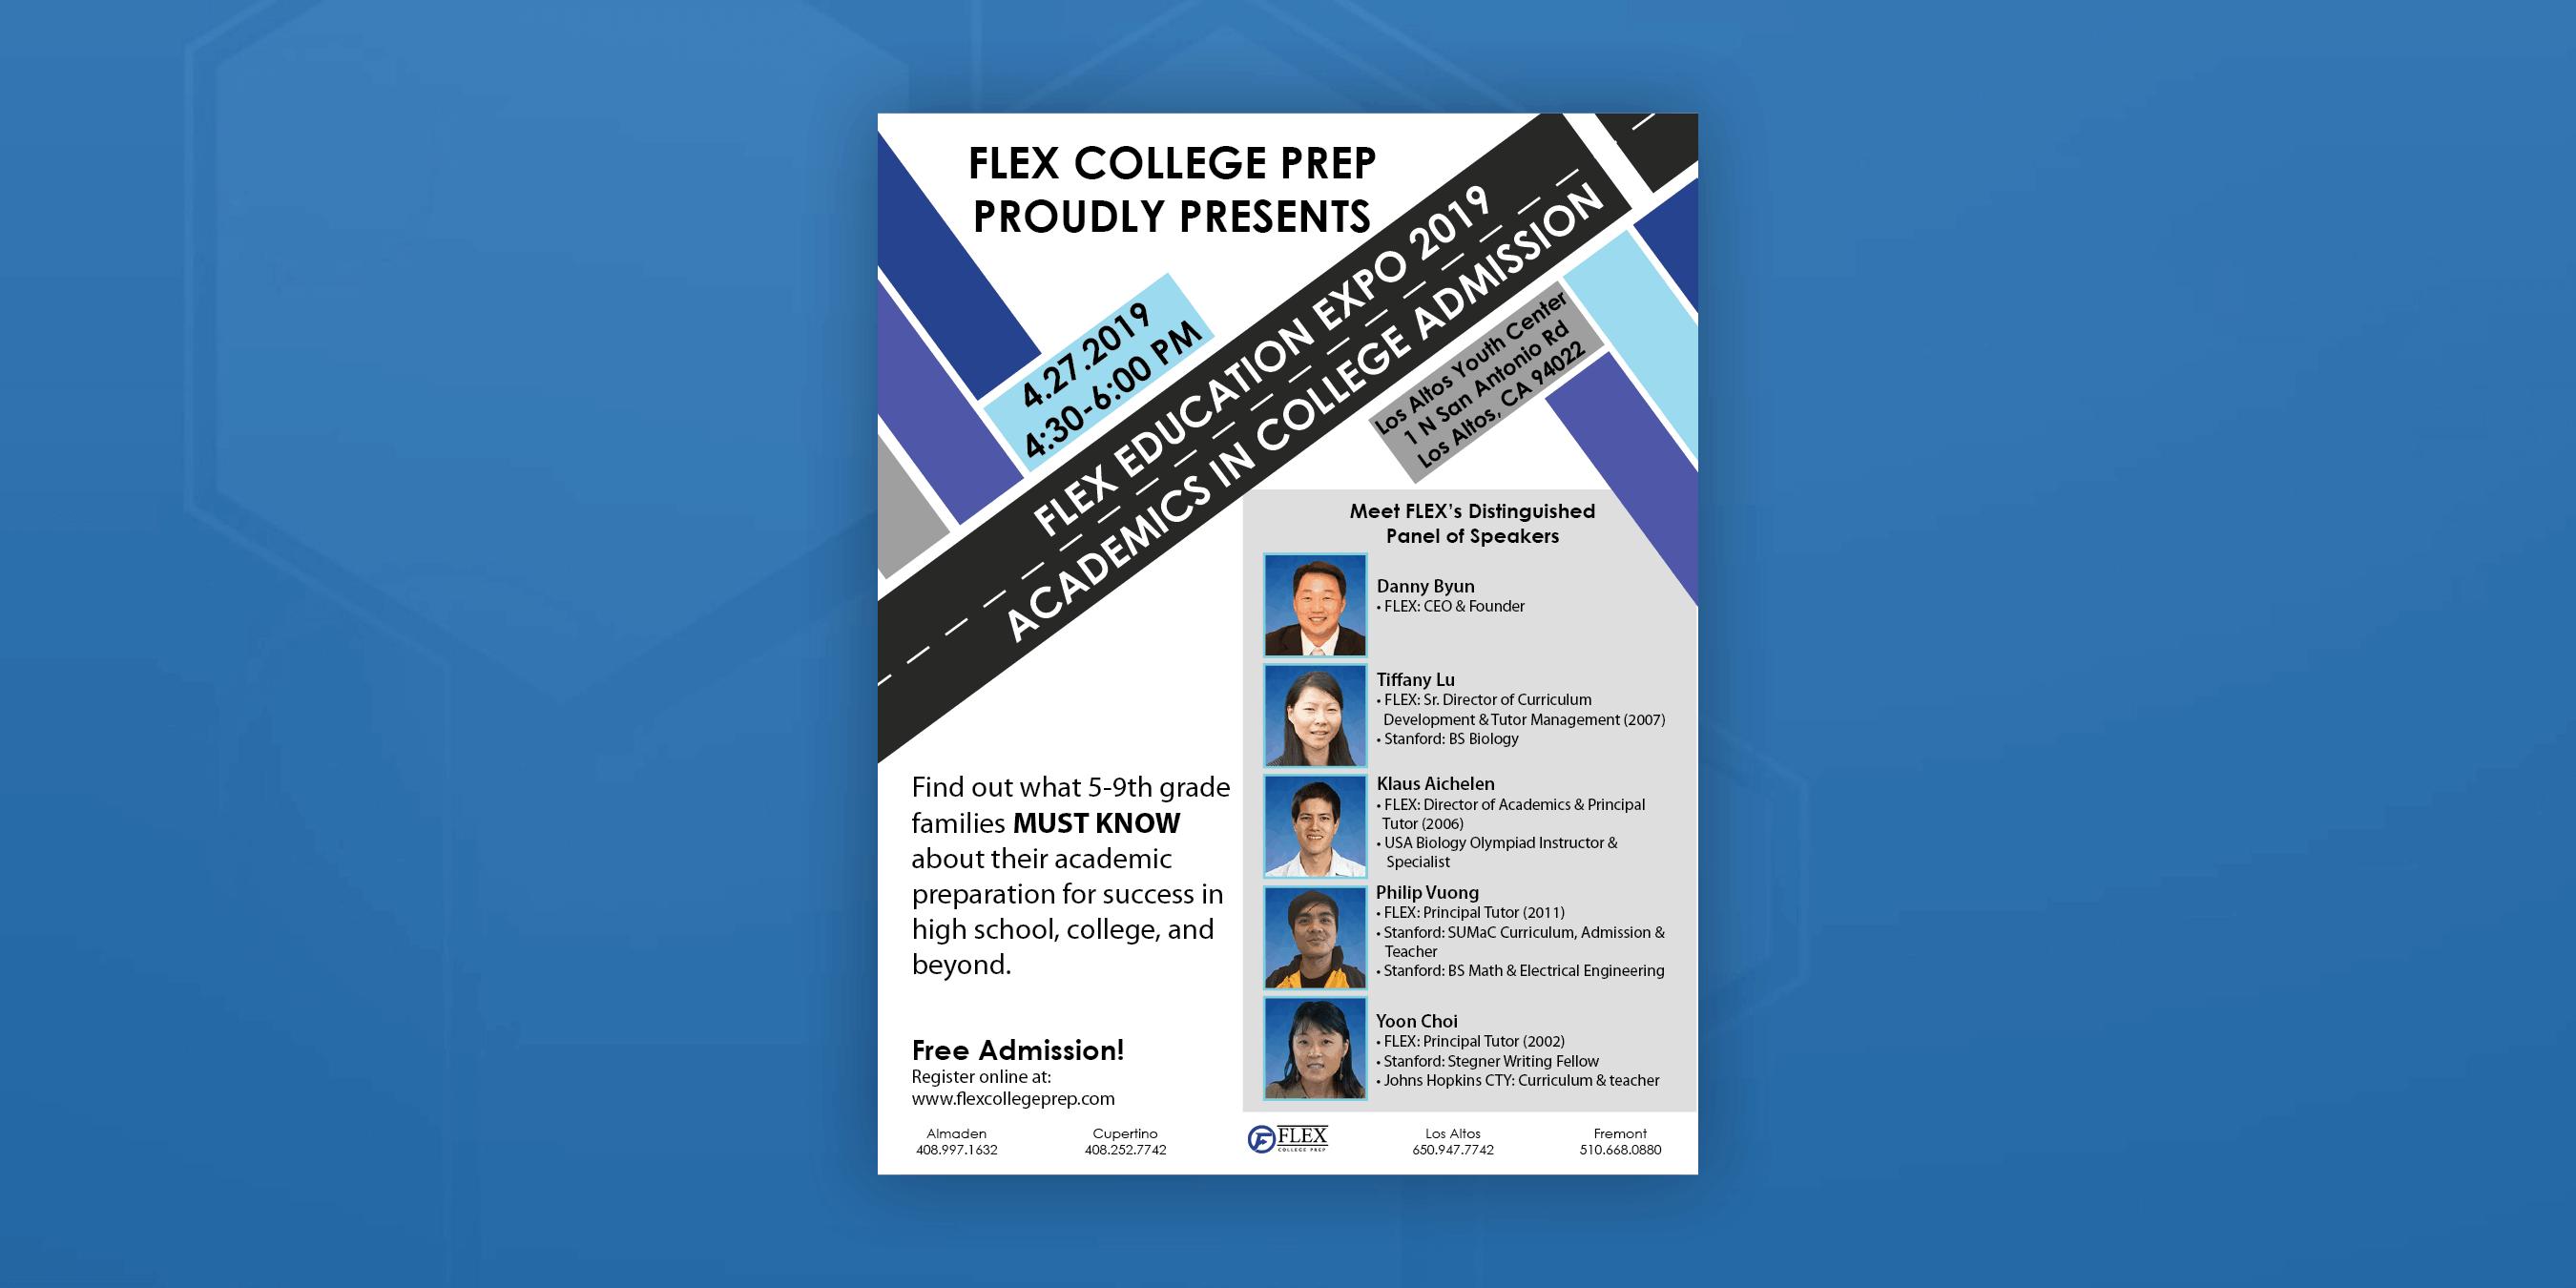 FLEX Academic Programs Education Expo 2019 | FLEX College Prep